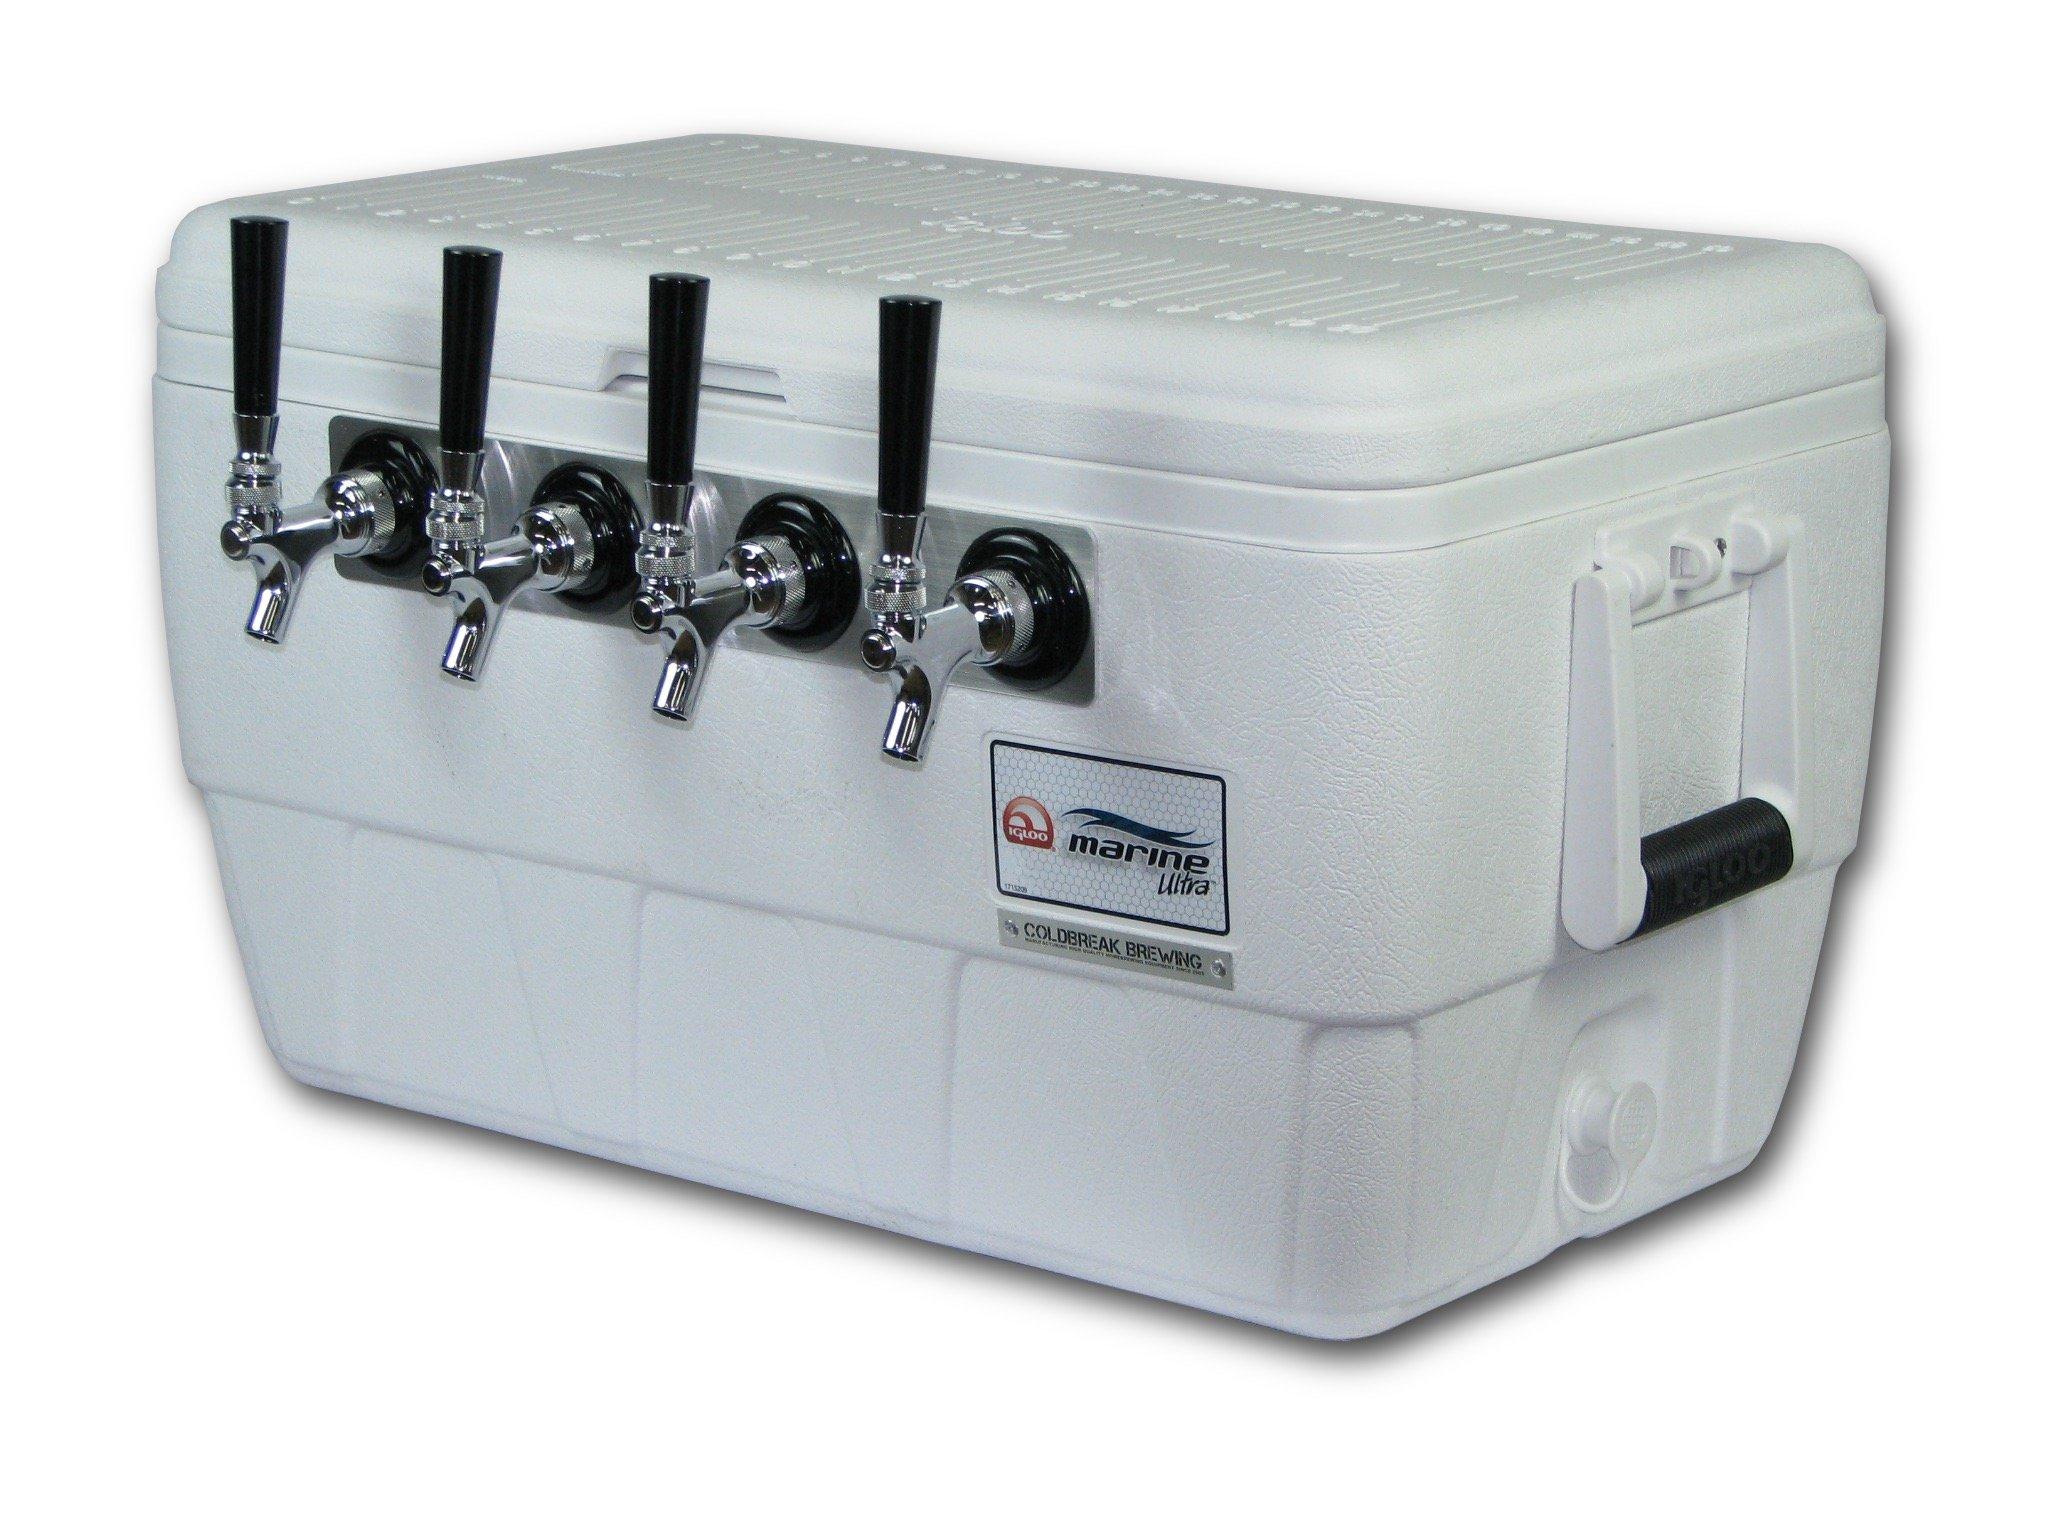 Coldbreak Brewing Equipment CBJB48QT4T Jockey Box, 4 Tap, Marine Pass Through, 48 quart Cooler, 50' Coils, 0.25'' ID, 0.3125'' OD, Stainless Steel, White